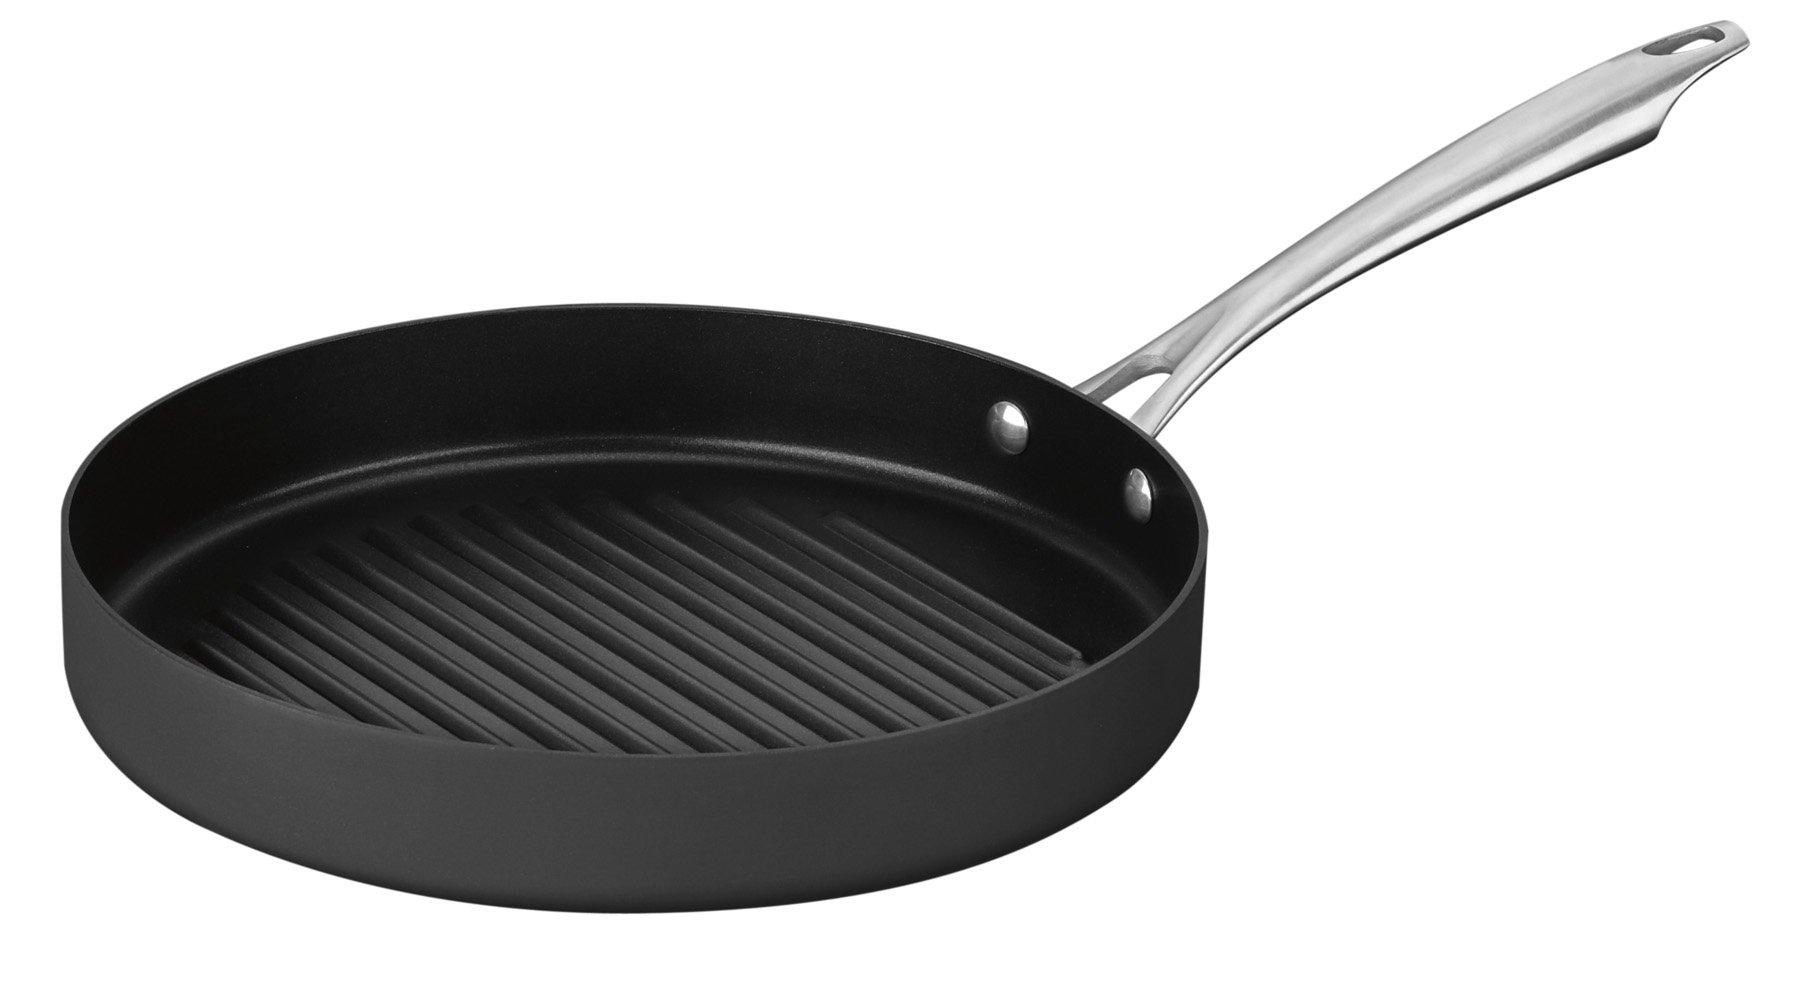 Cuisinart DSA30-28 Dishwasher Safe Hard-Anodized 11-Inch Round Grill Pan